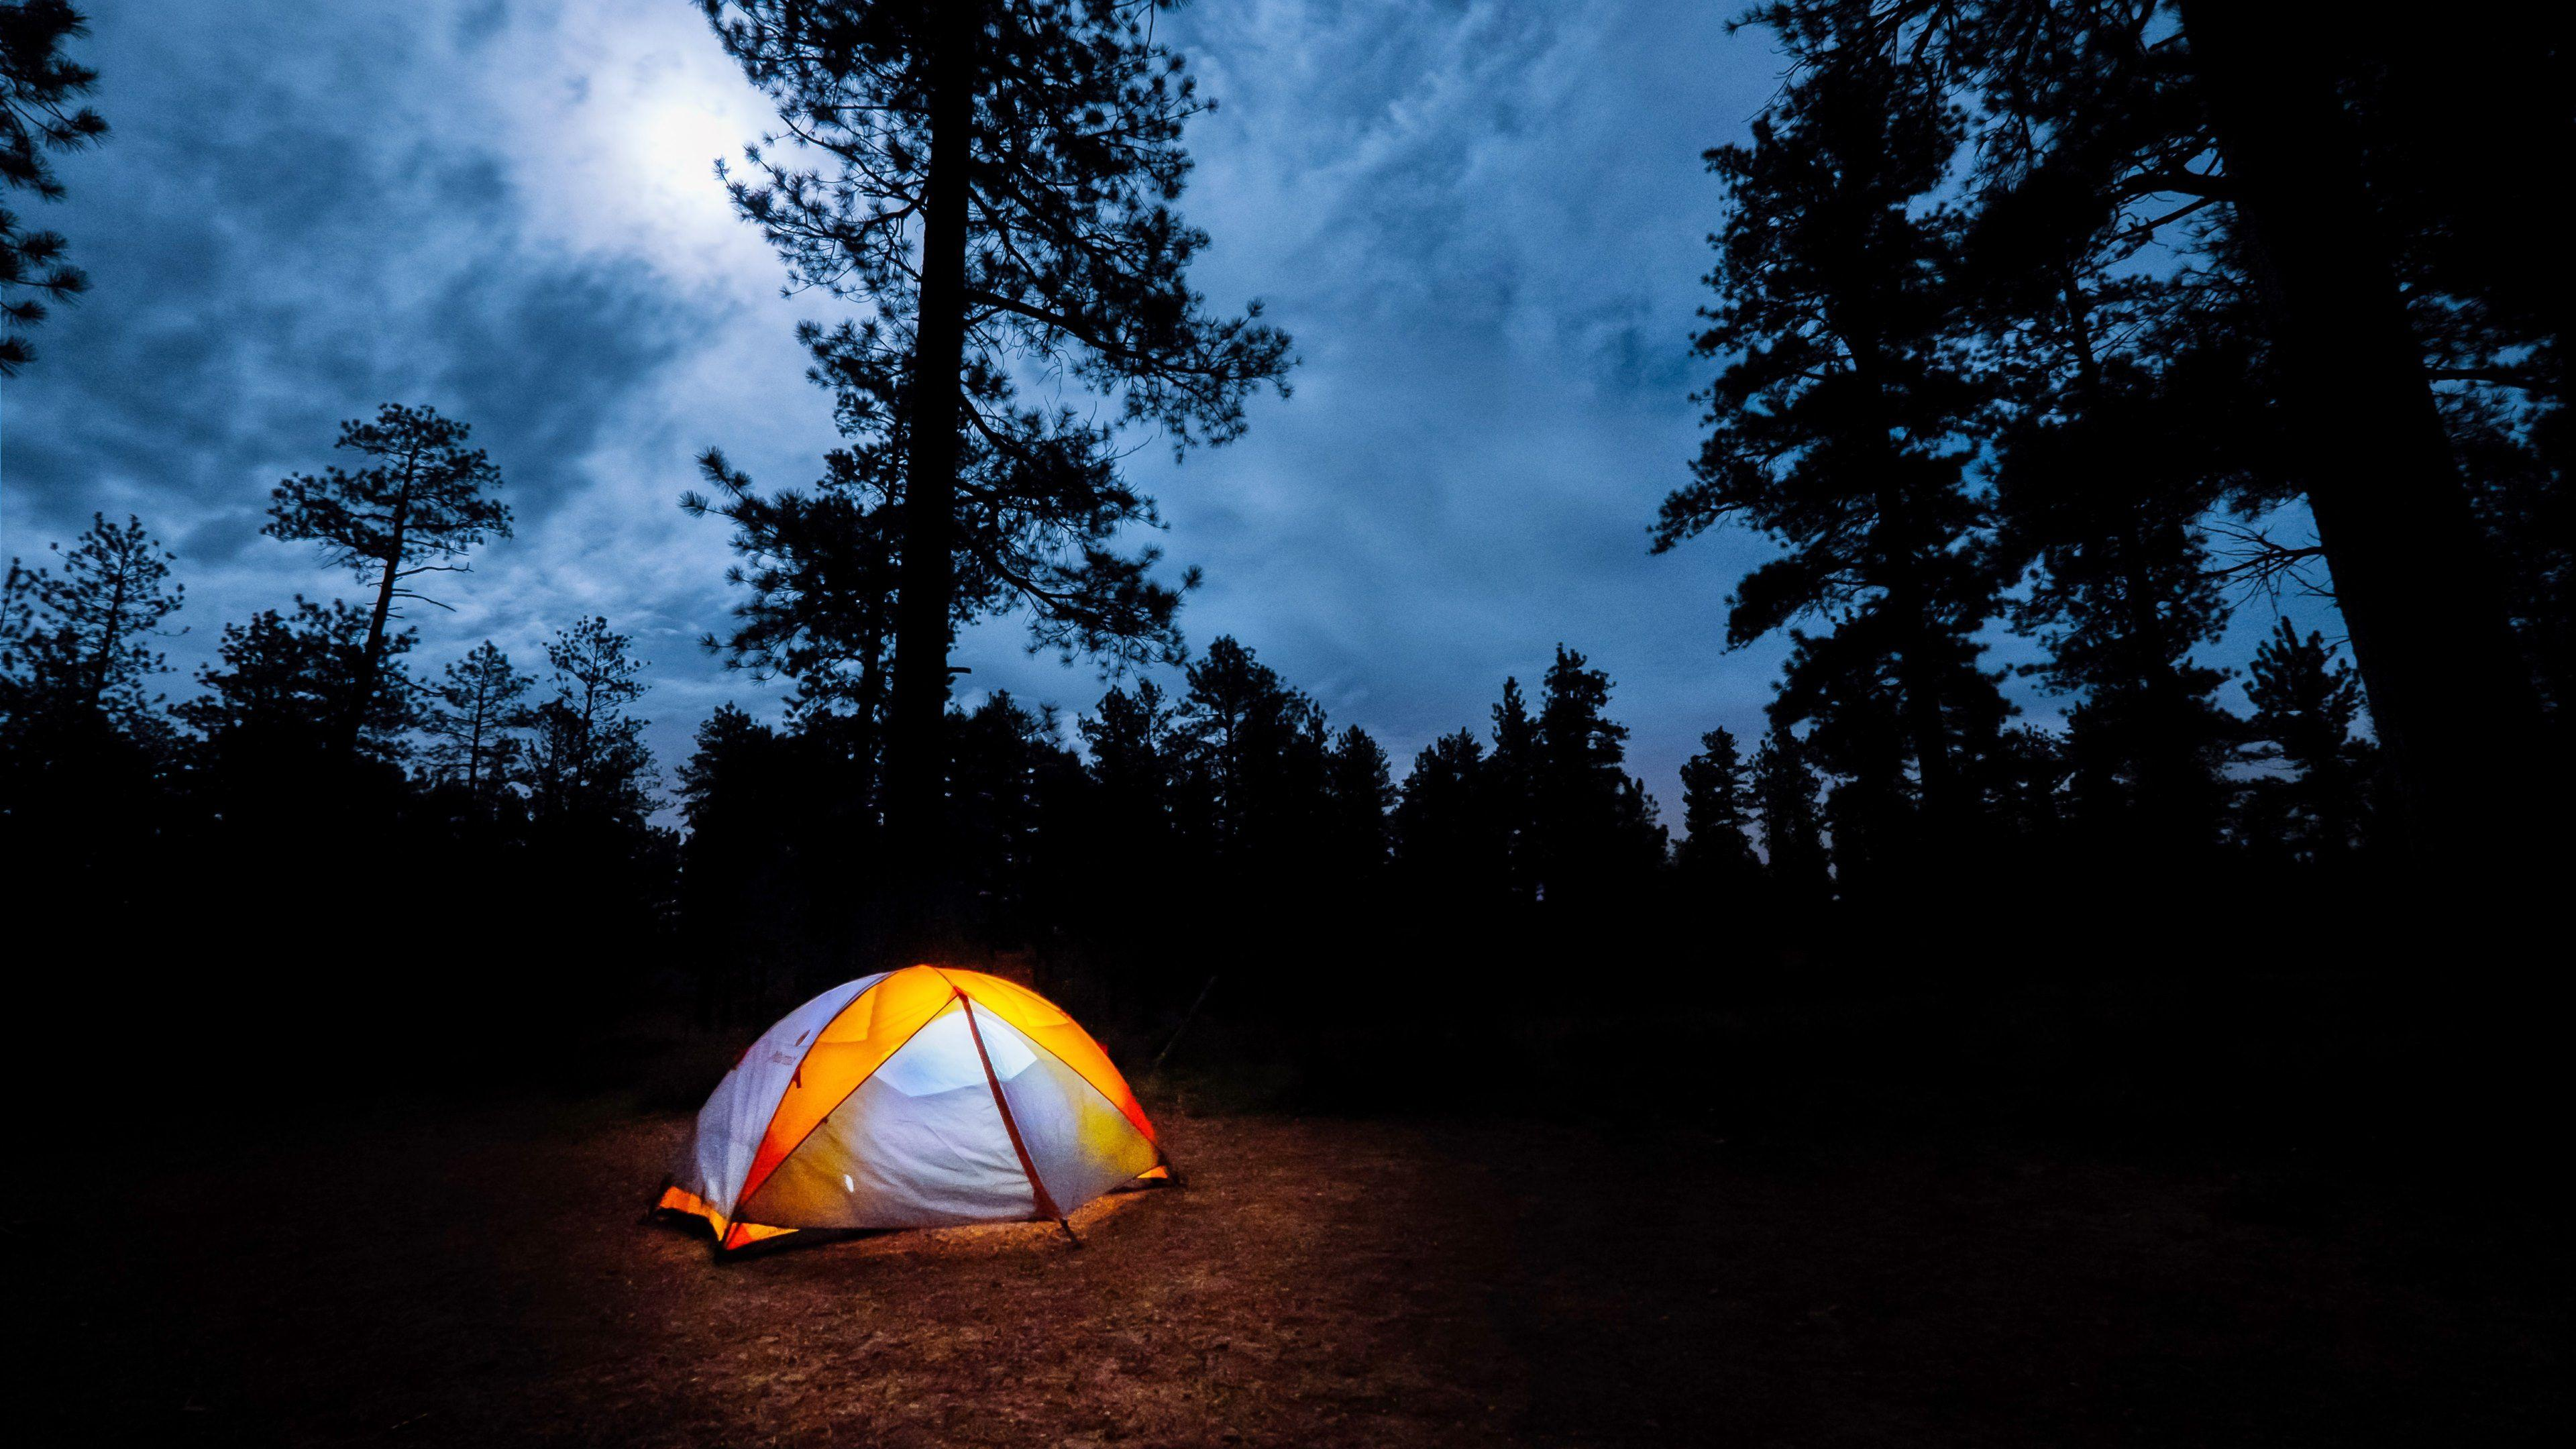 Camping HD Wallpapers - Wallpaper Cave